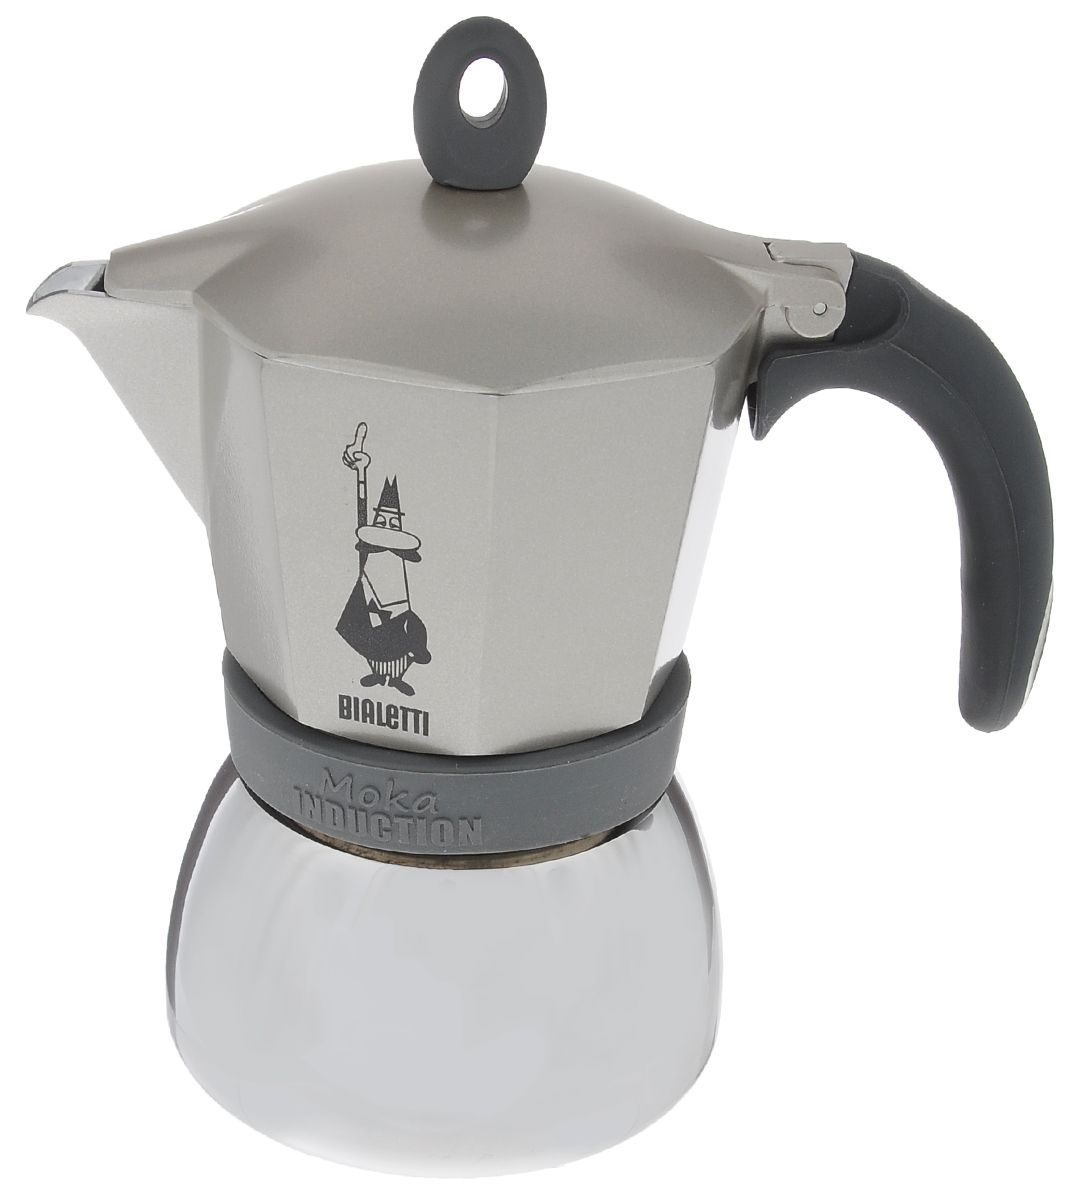 Гейзерная кофеварка Bialetti Moka Induction, на 6 чашек, серый цена